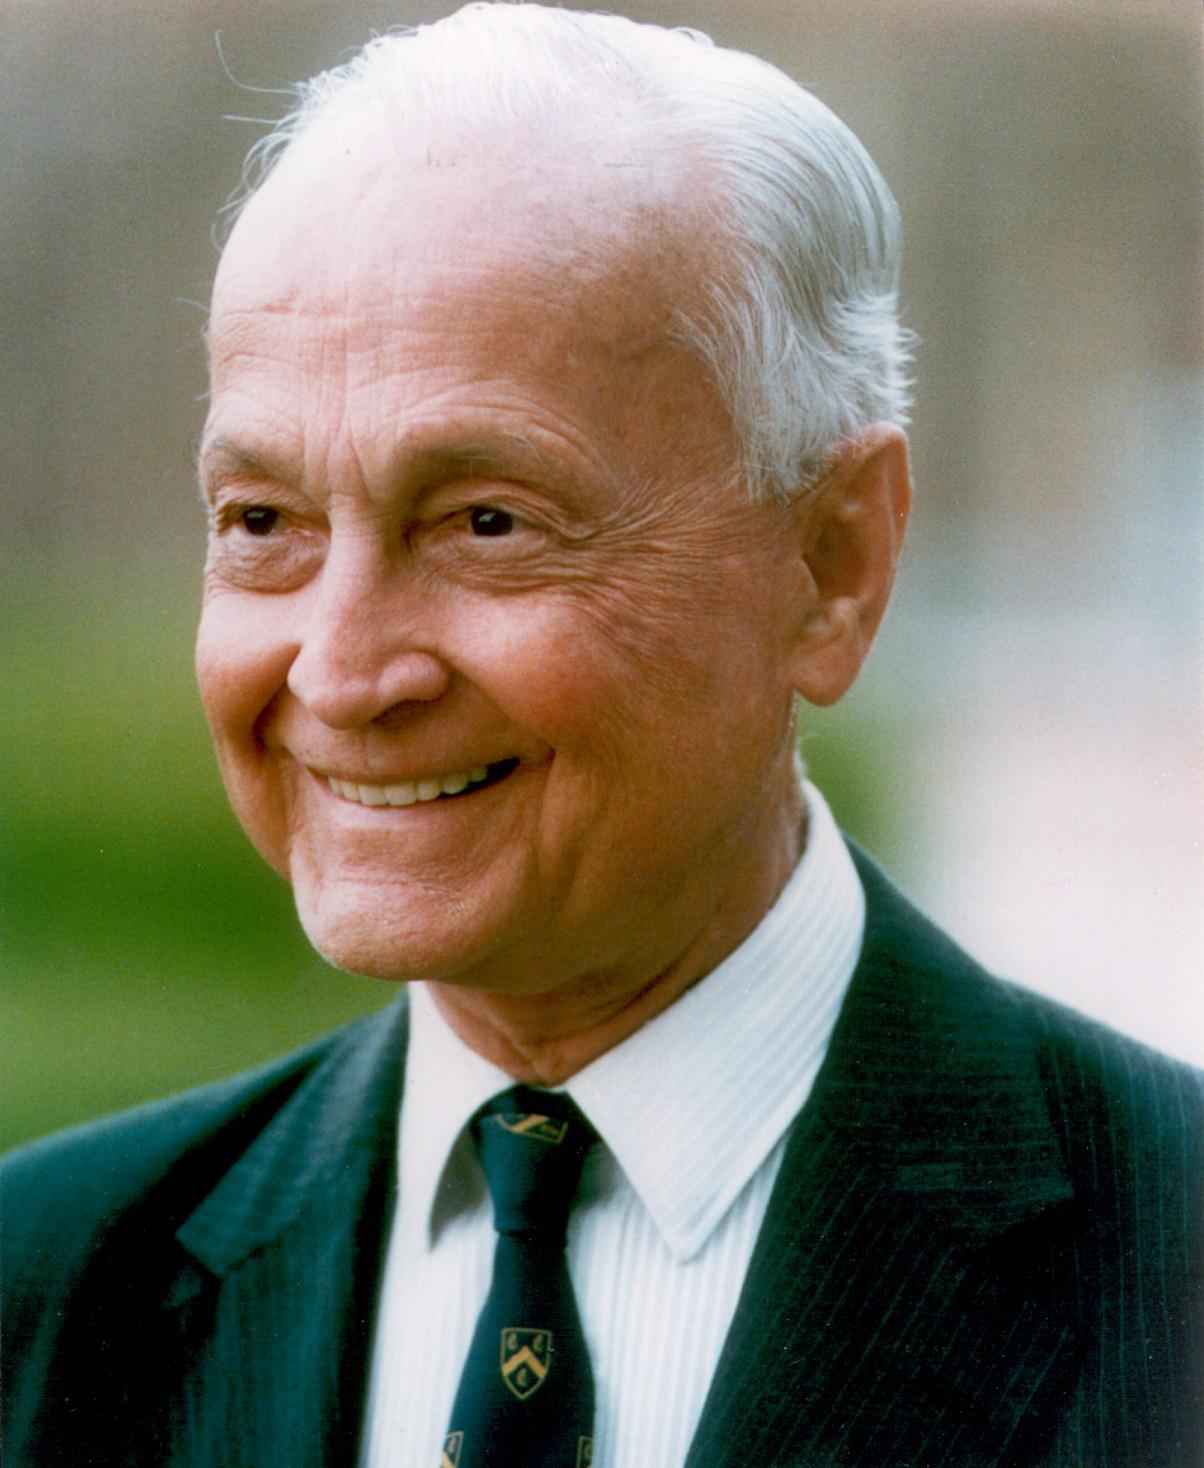 Sir John Templeton (1912 - 2008)